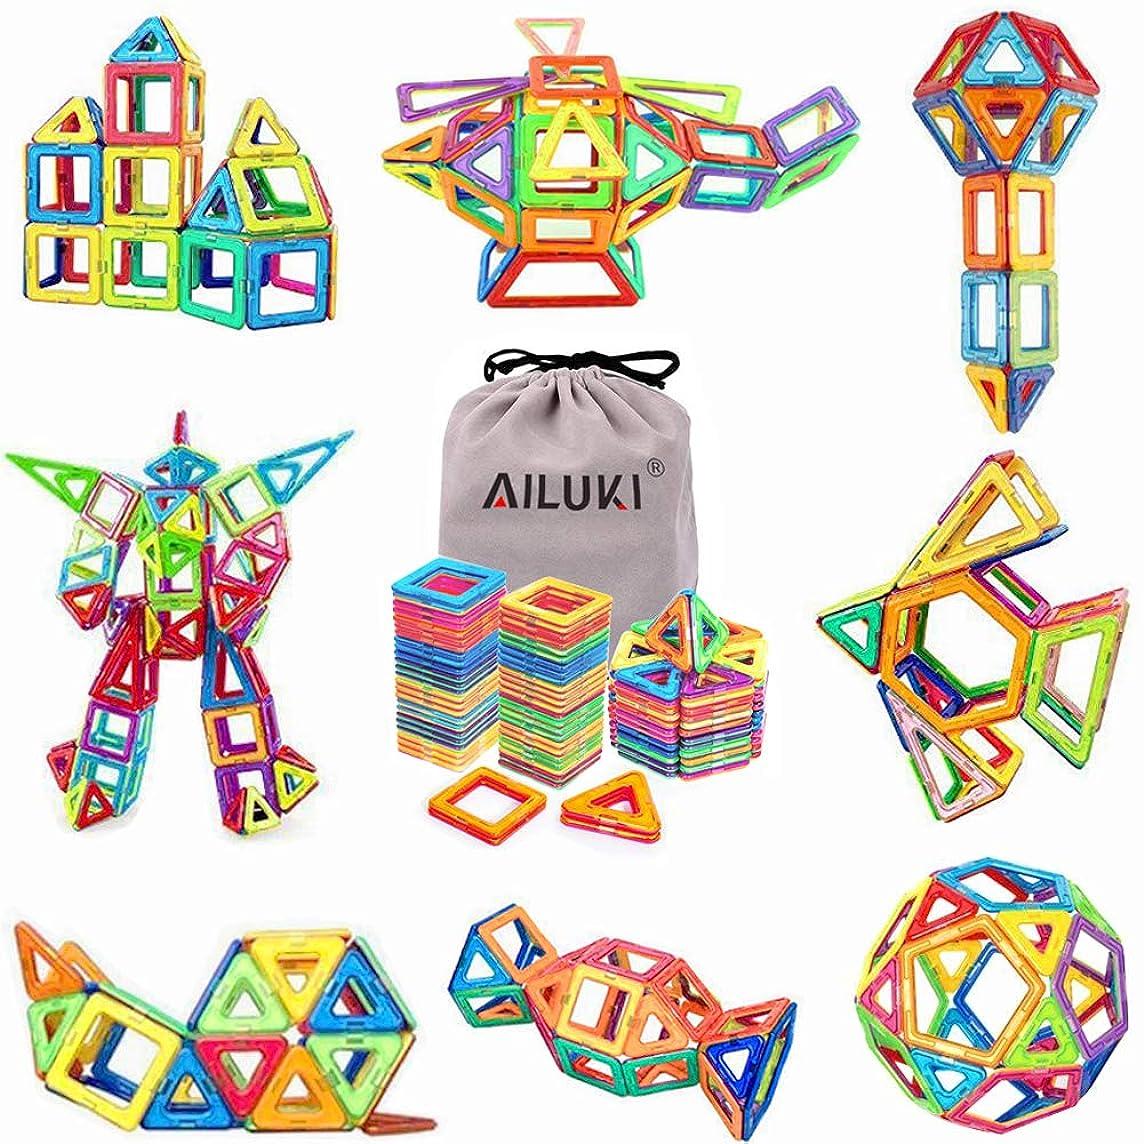 Magnetic Blocks,Ailuki 109 Pcs 3D Magnetic Building Blocks Set Magnet Tiles Educational Construction Kit for Children Creative Imagination Development Magnet Toys